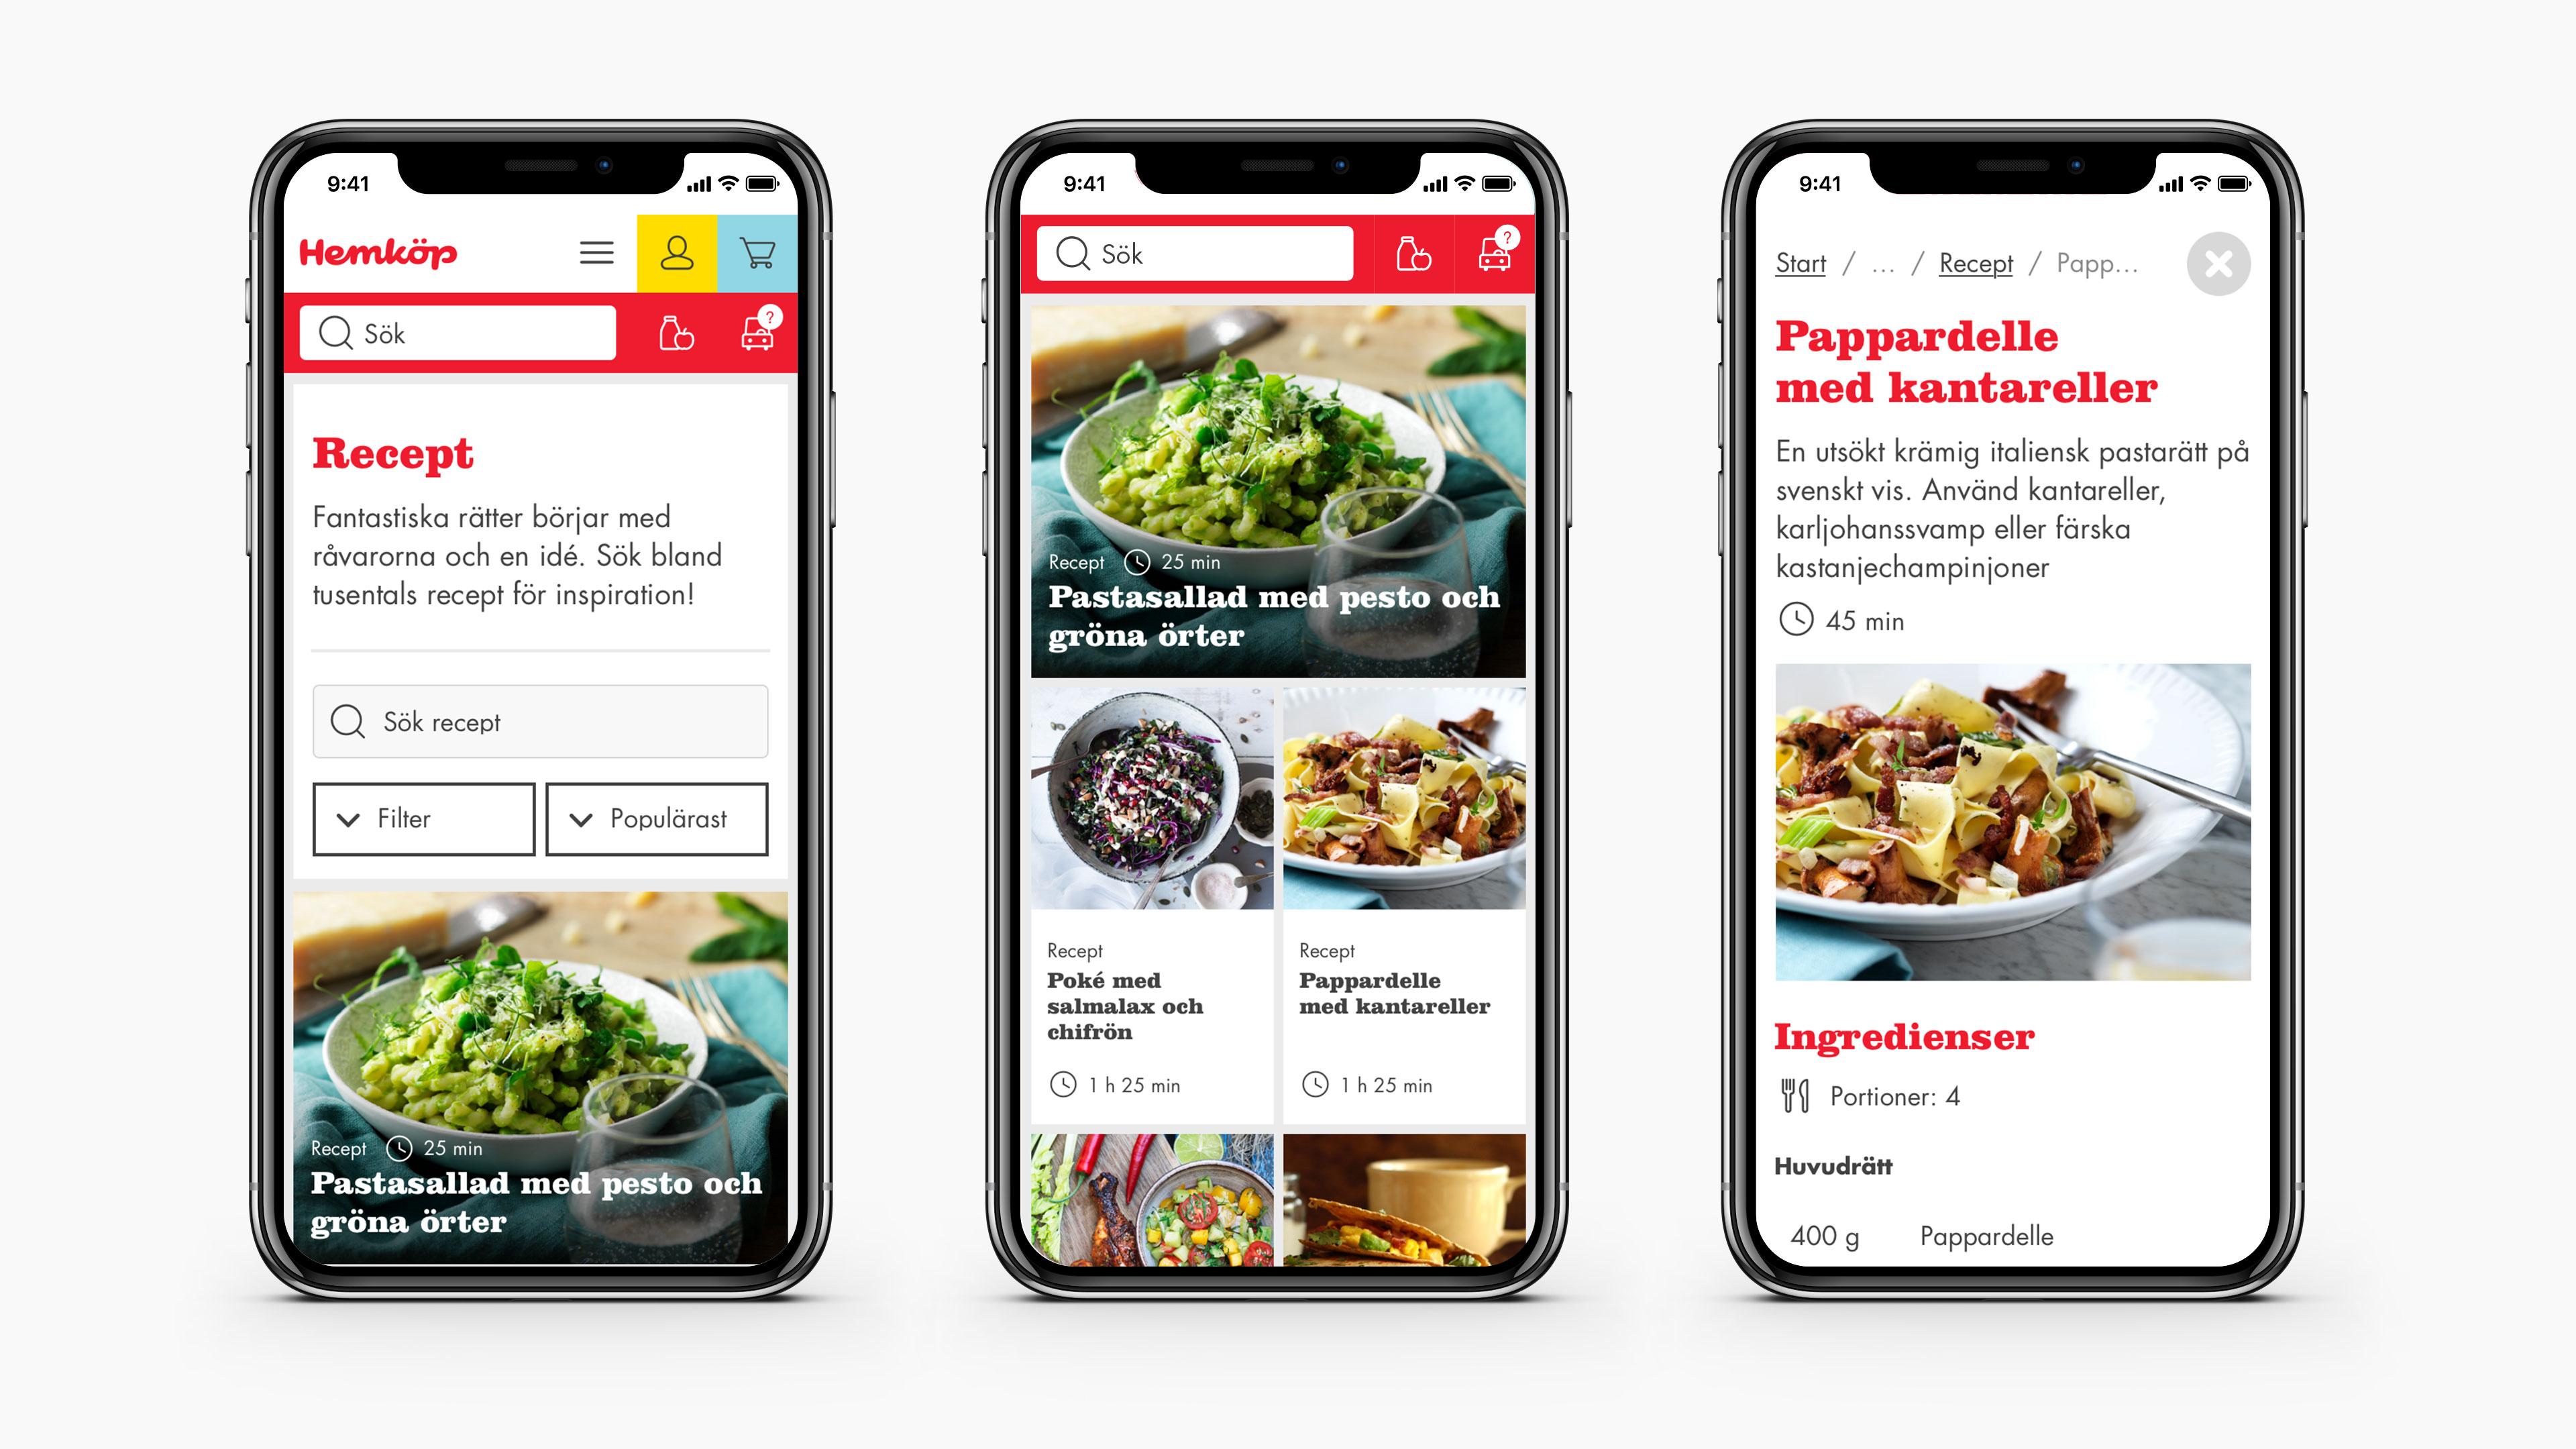 HK_recipes_iphone